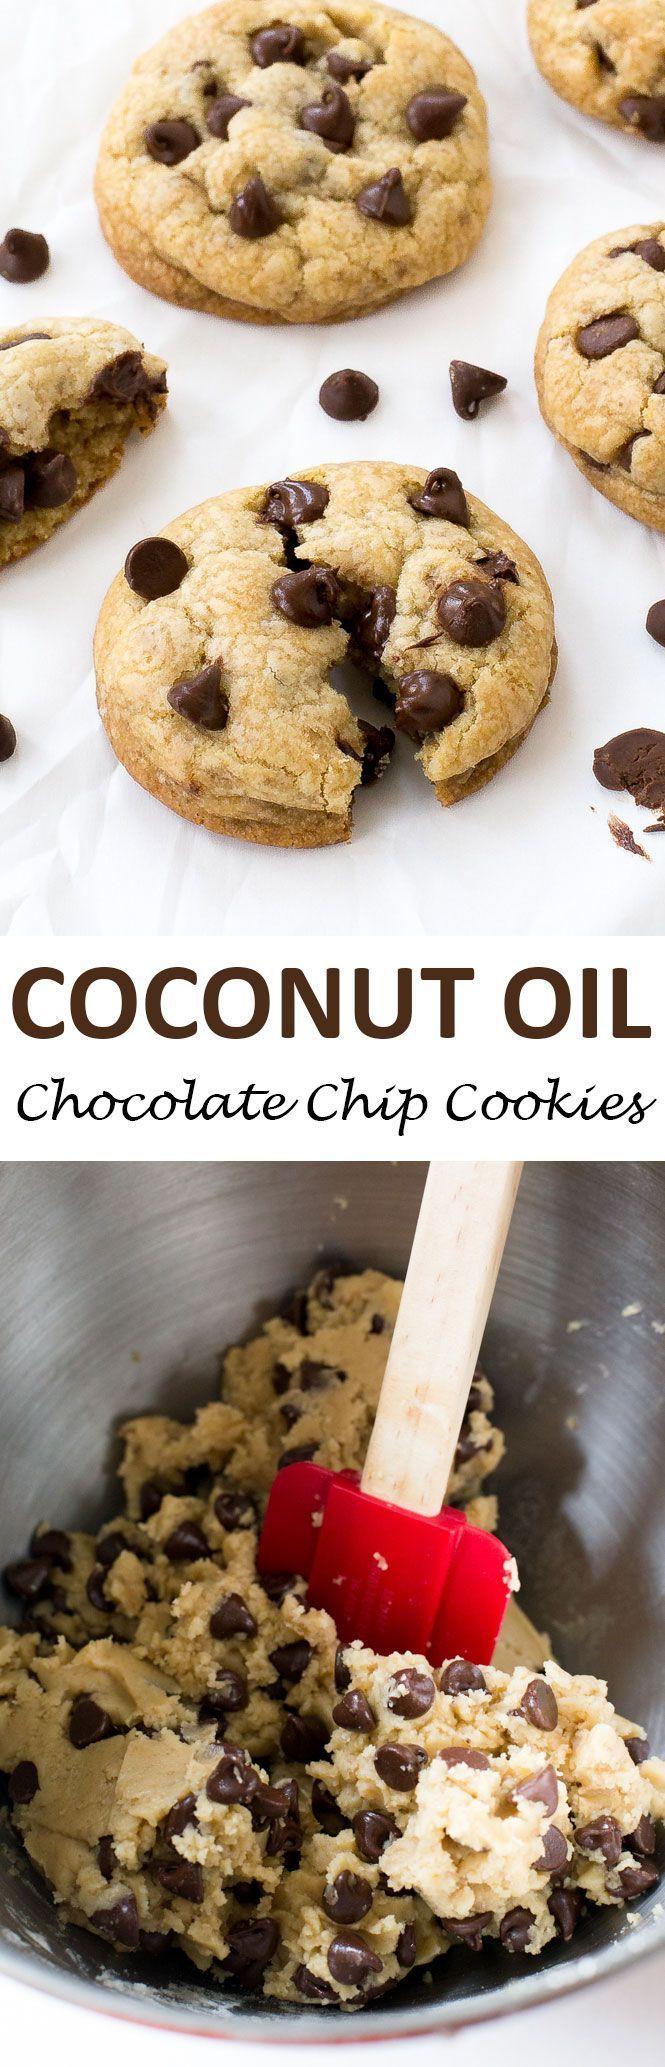 Coconut Oil Chocolate Chip Cookies | Recipe | Chocolate ...